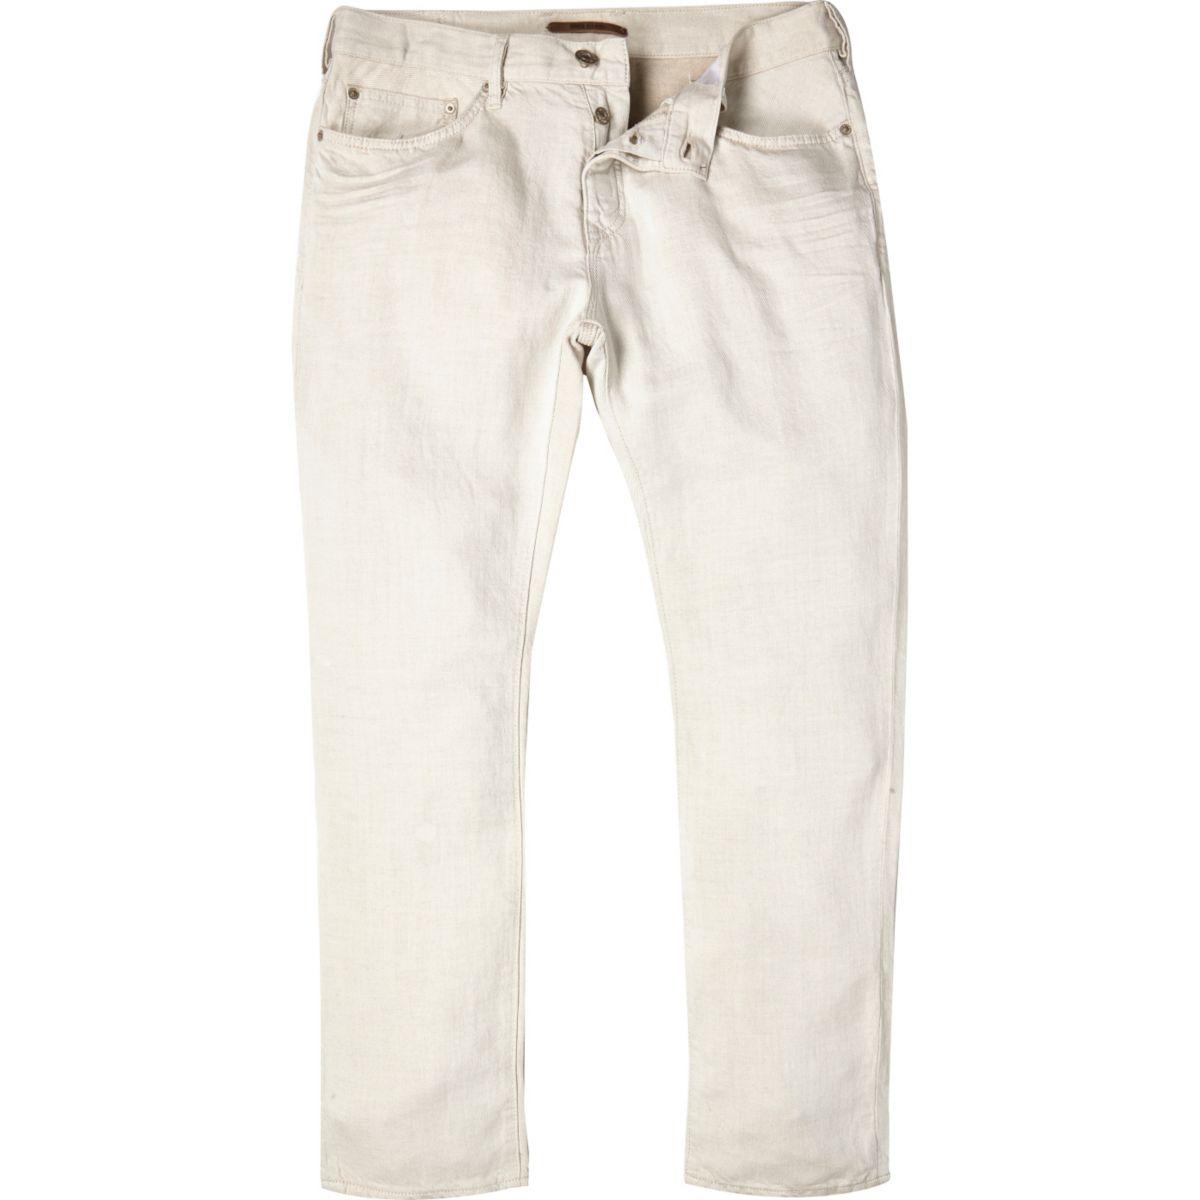 White linen slim chino pants